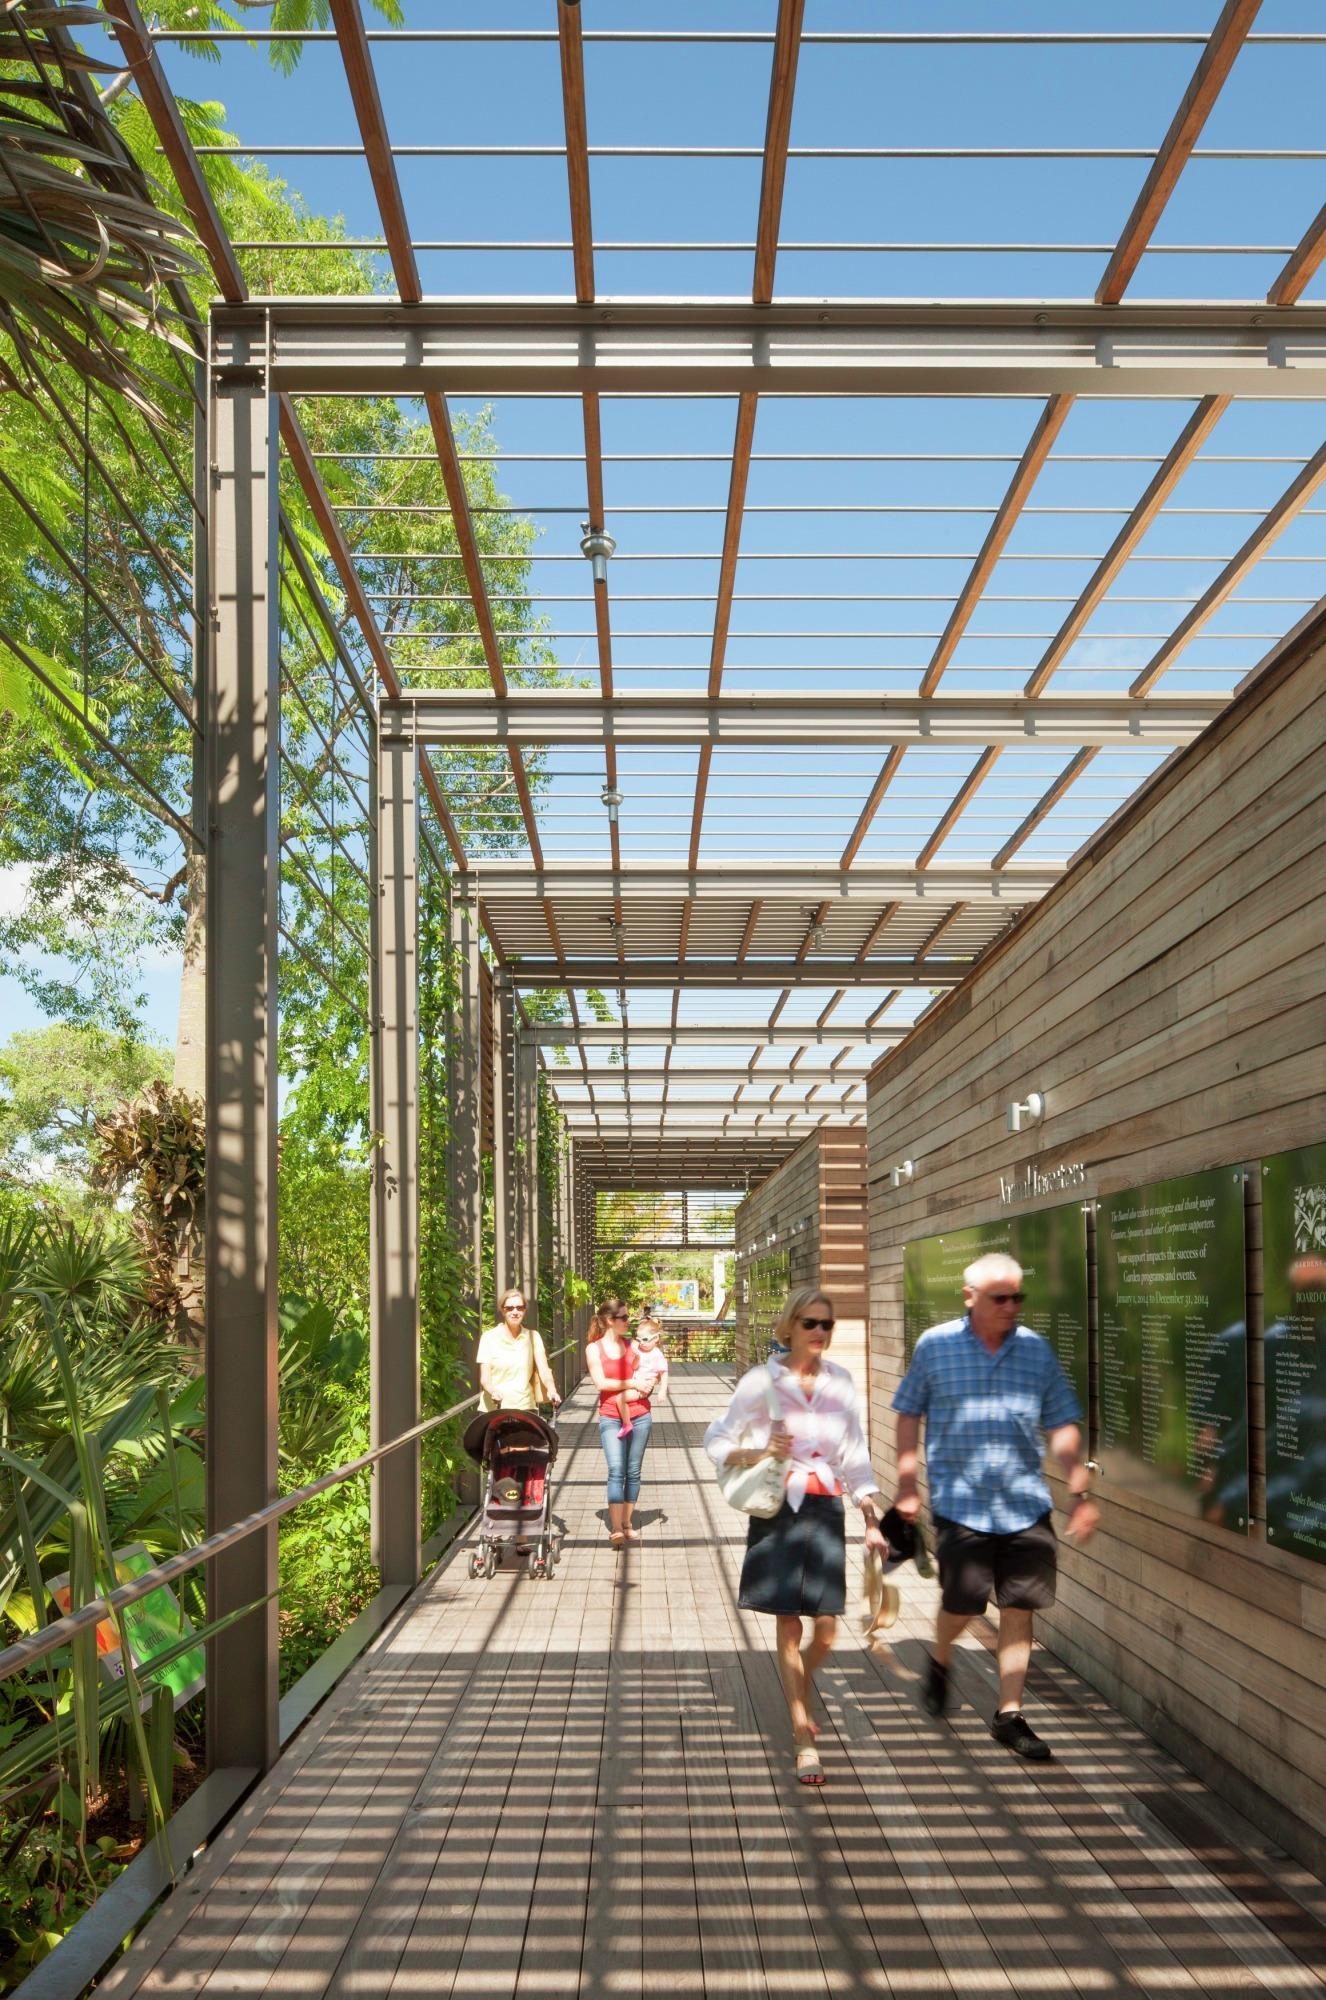 Gallery of Naples Botanical Garden Visitor Center  LakeFlato Architects  5